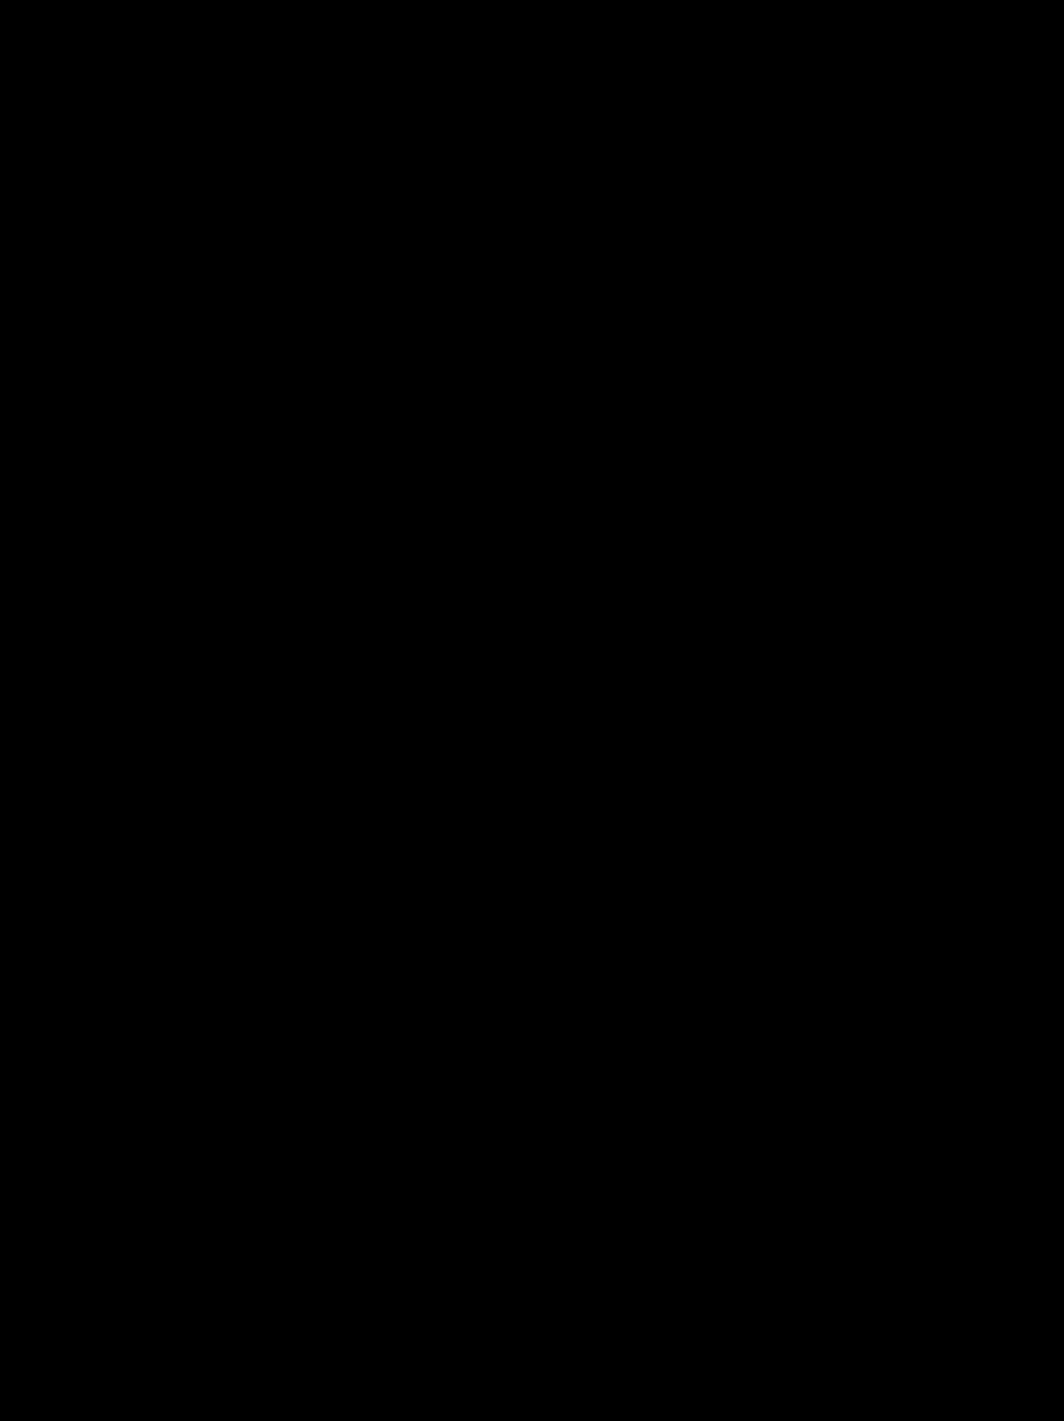 Jumlah Sudut Segilima : jumlah, sudut, segilima, Jumlah, Titik, Sudut, Bangun, Datar, Bimbel, Brilian